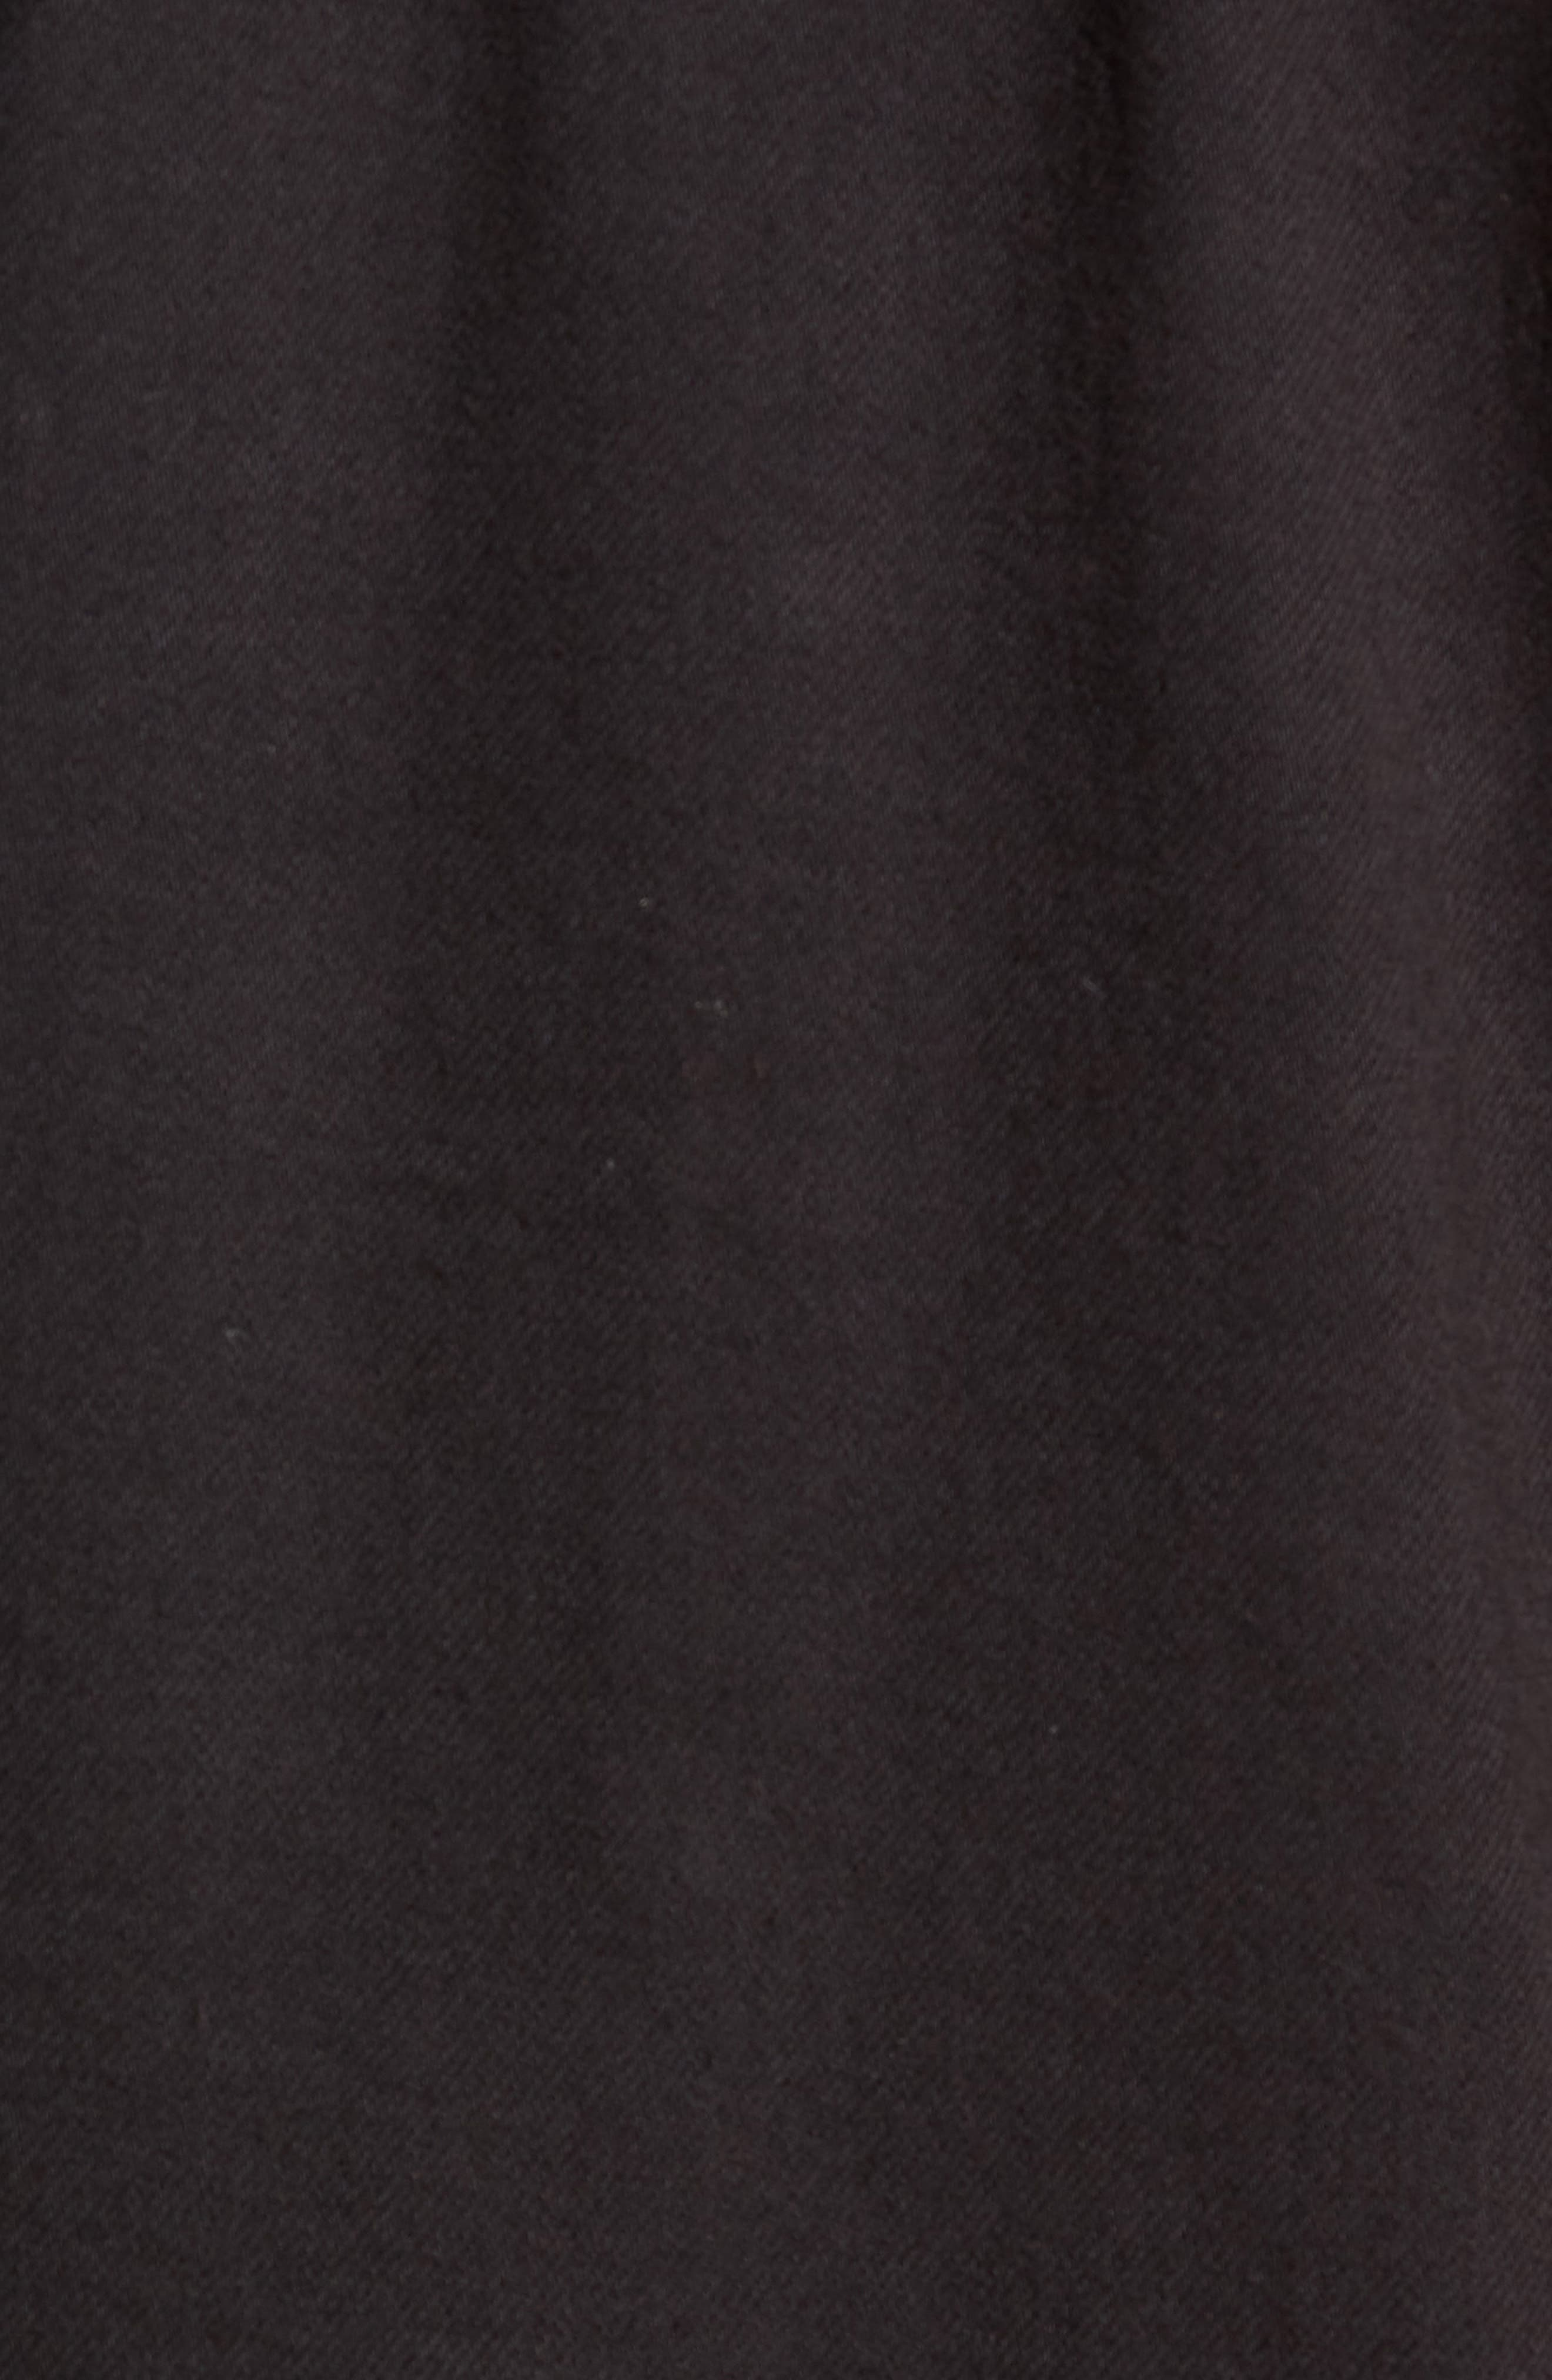 Scout Denim Jacket,                             Alternate thumbnail 7, color,                             VIVID BLACK COATED